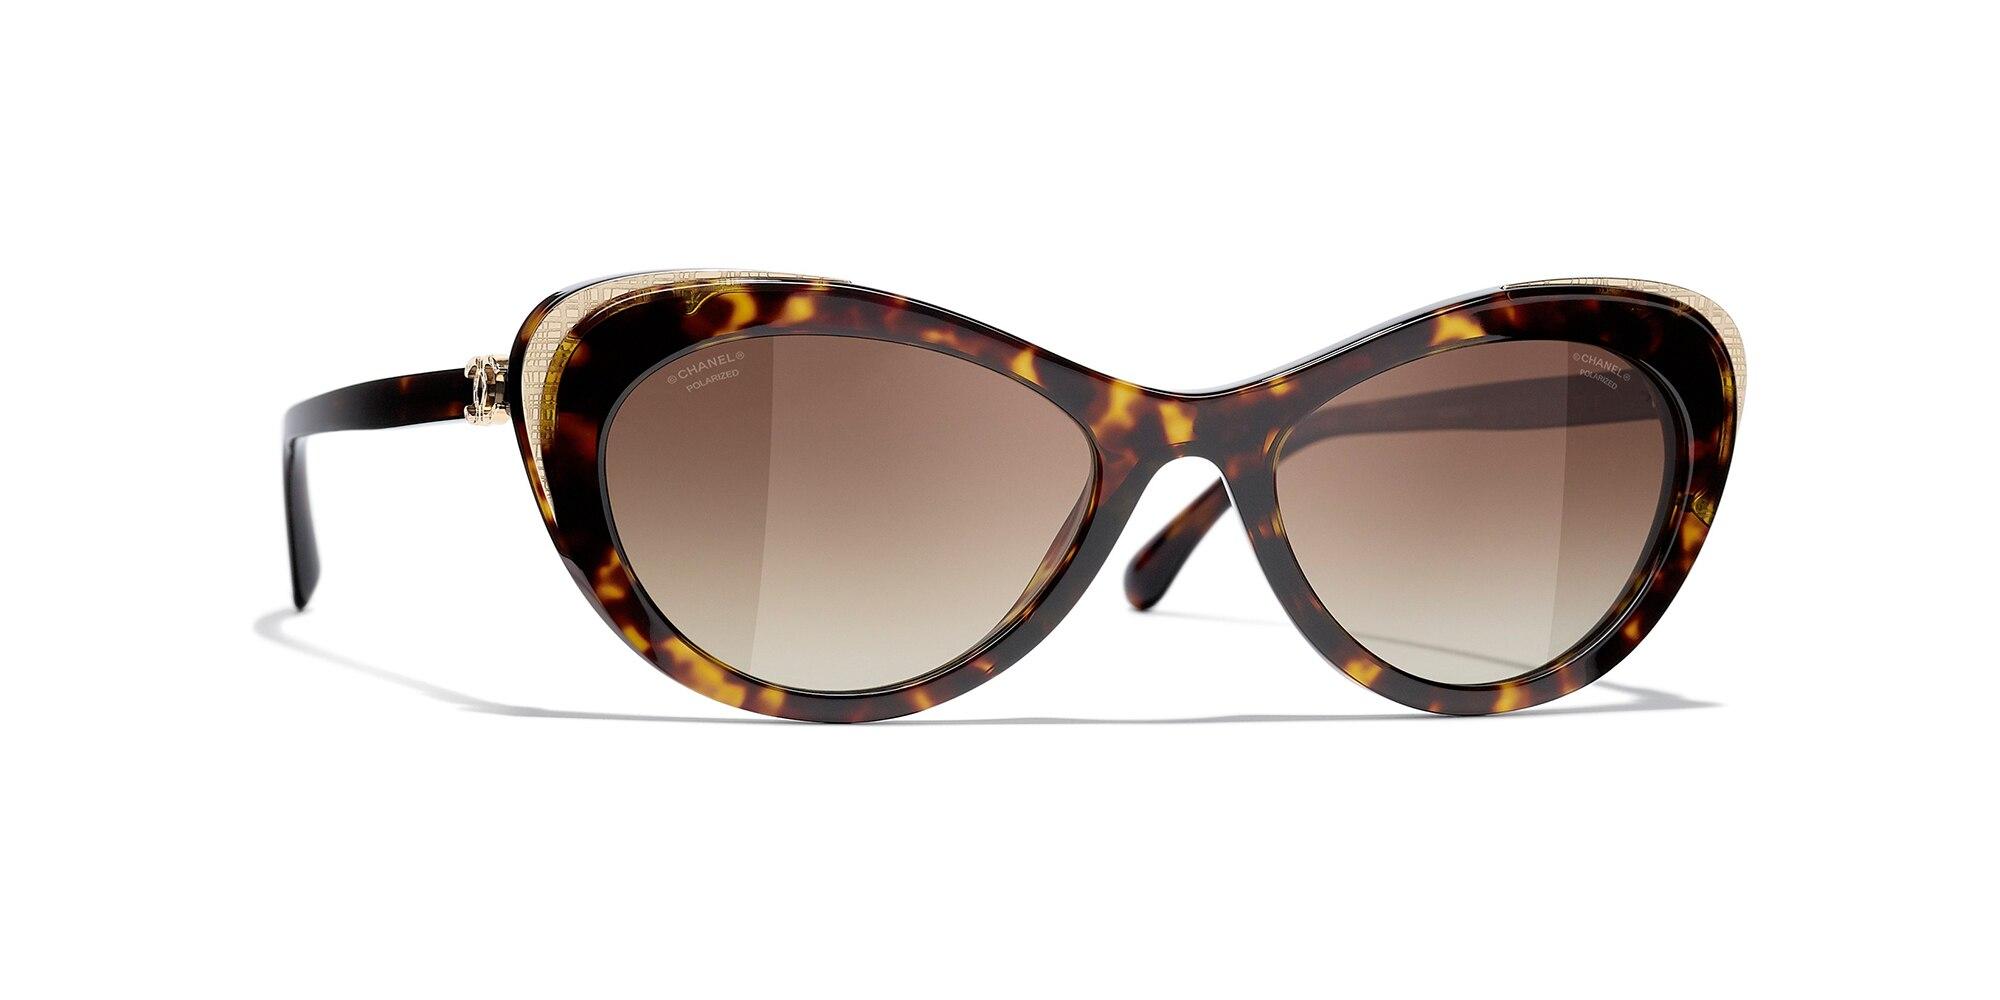 Chanel Woman  Cat Eye Sunglasses CH5432 -  Frame color: Dark Tortoise & Gold, Lens color: Brown